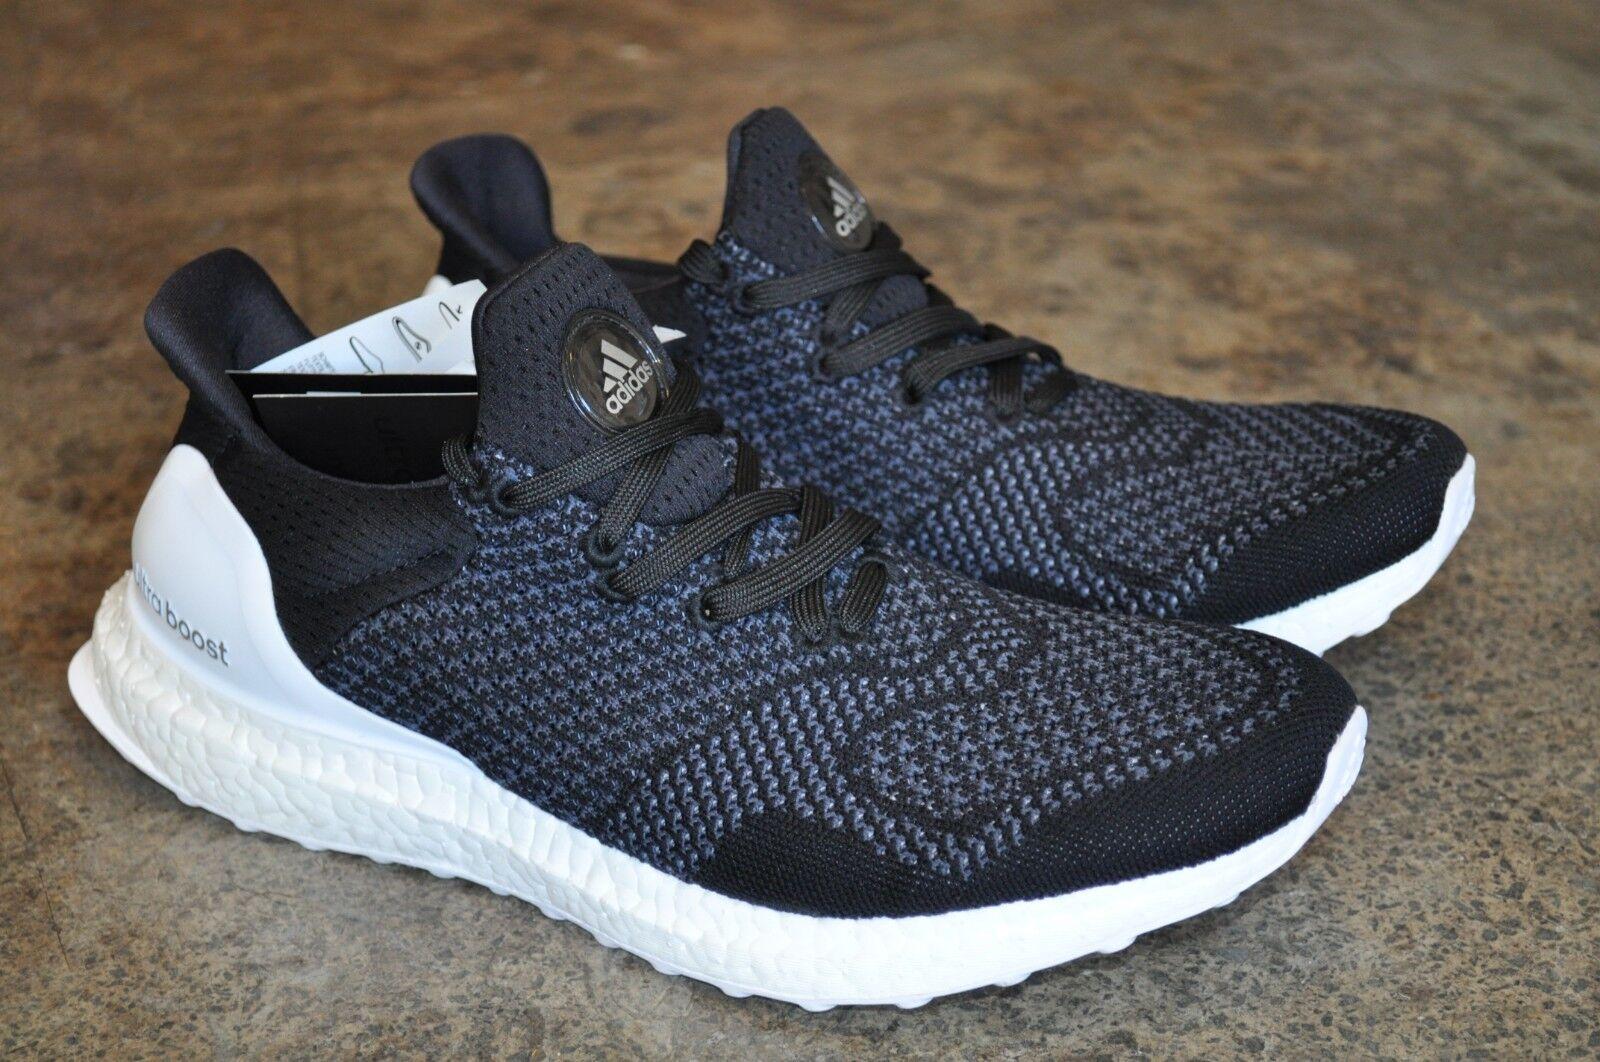 Adidas Ultra Boost Uncaged Hypebeast noir/blanc - noir/blanc Hypebeast 838549